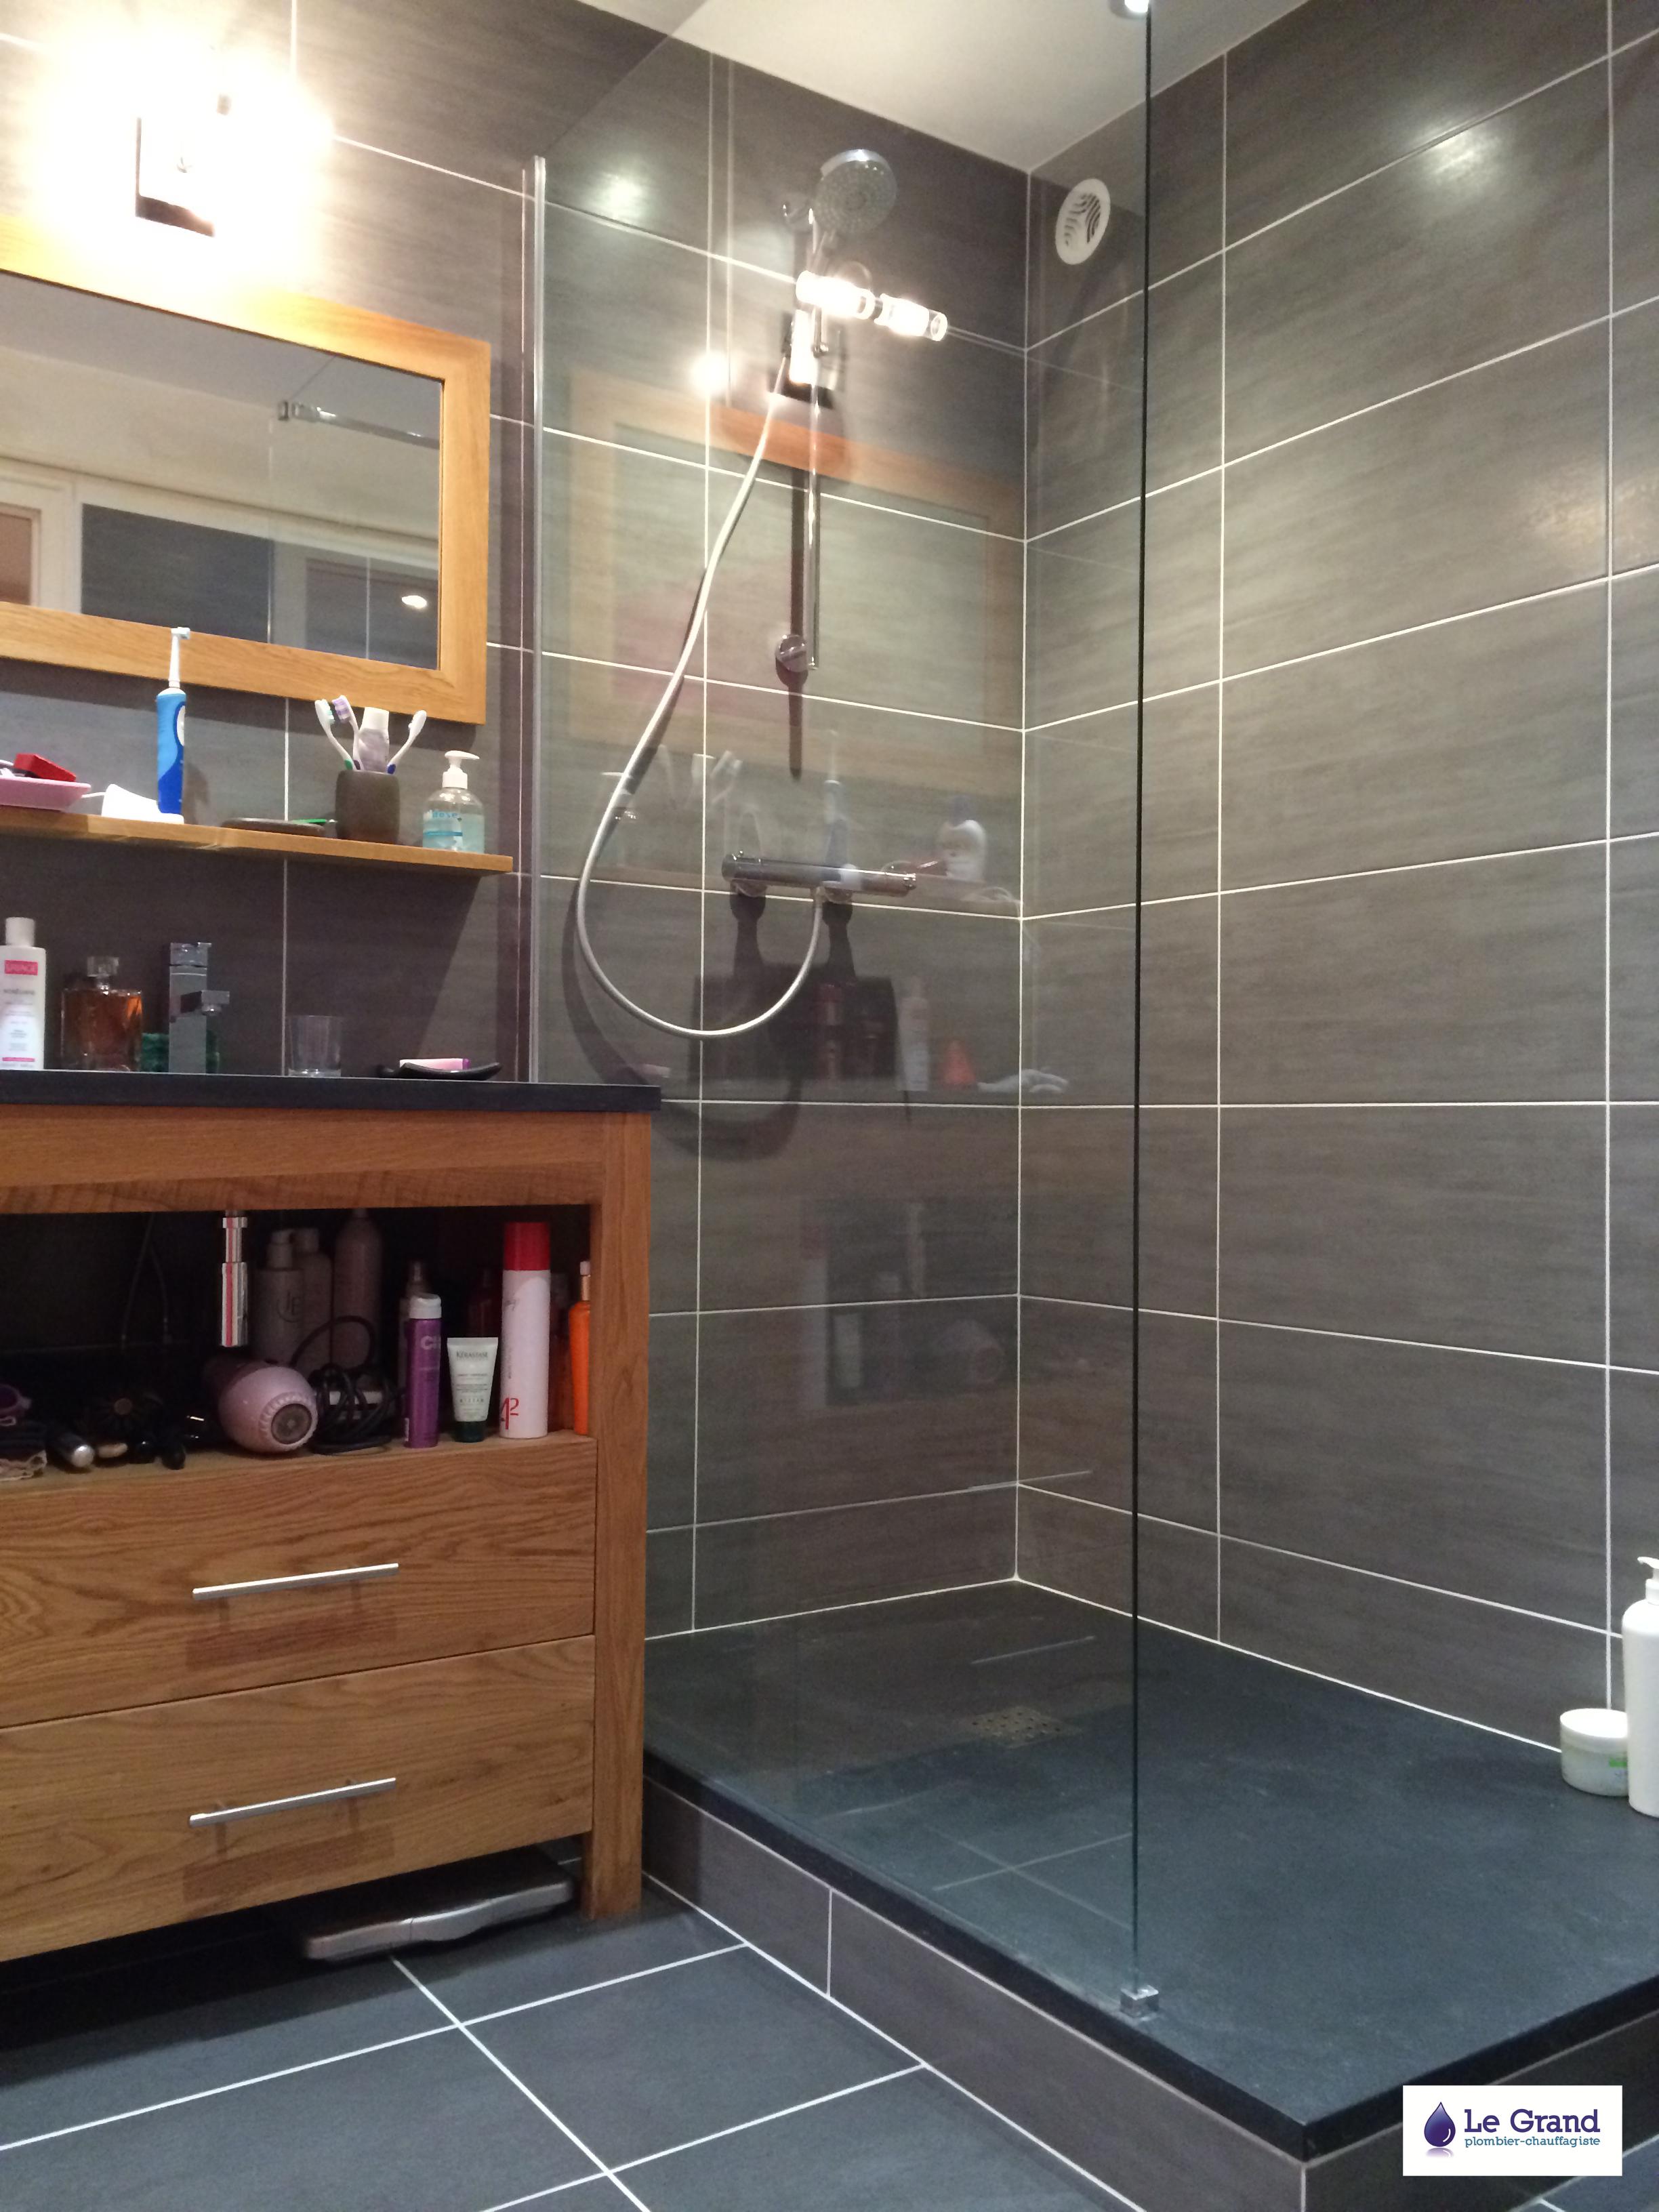 magasin salle de bain rennes free salle de moderne schmidt salle de salle de meilleur design. Black Bedroom Furniture Sets. Home Design Ideas